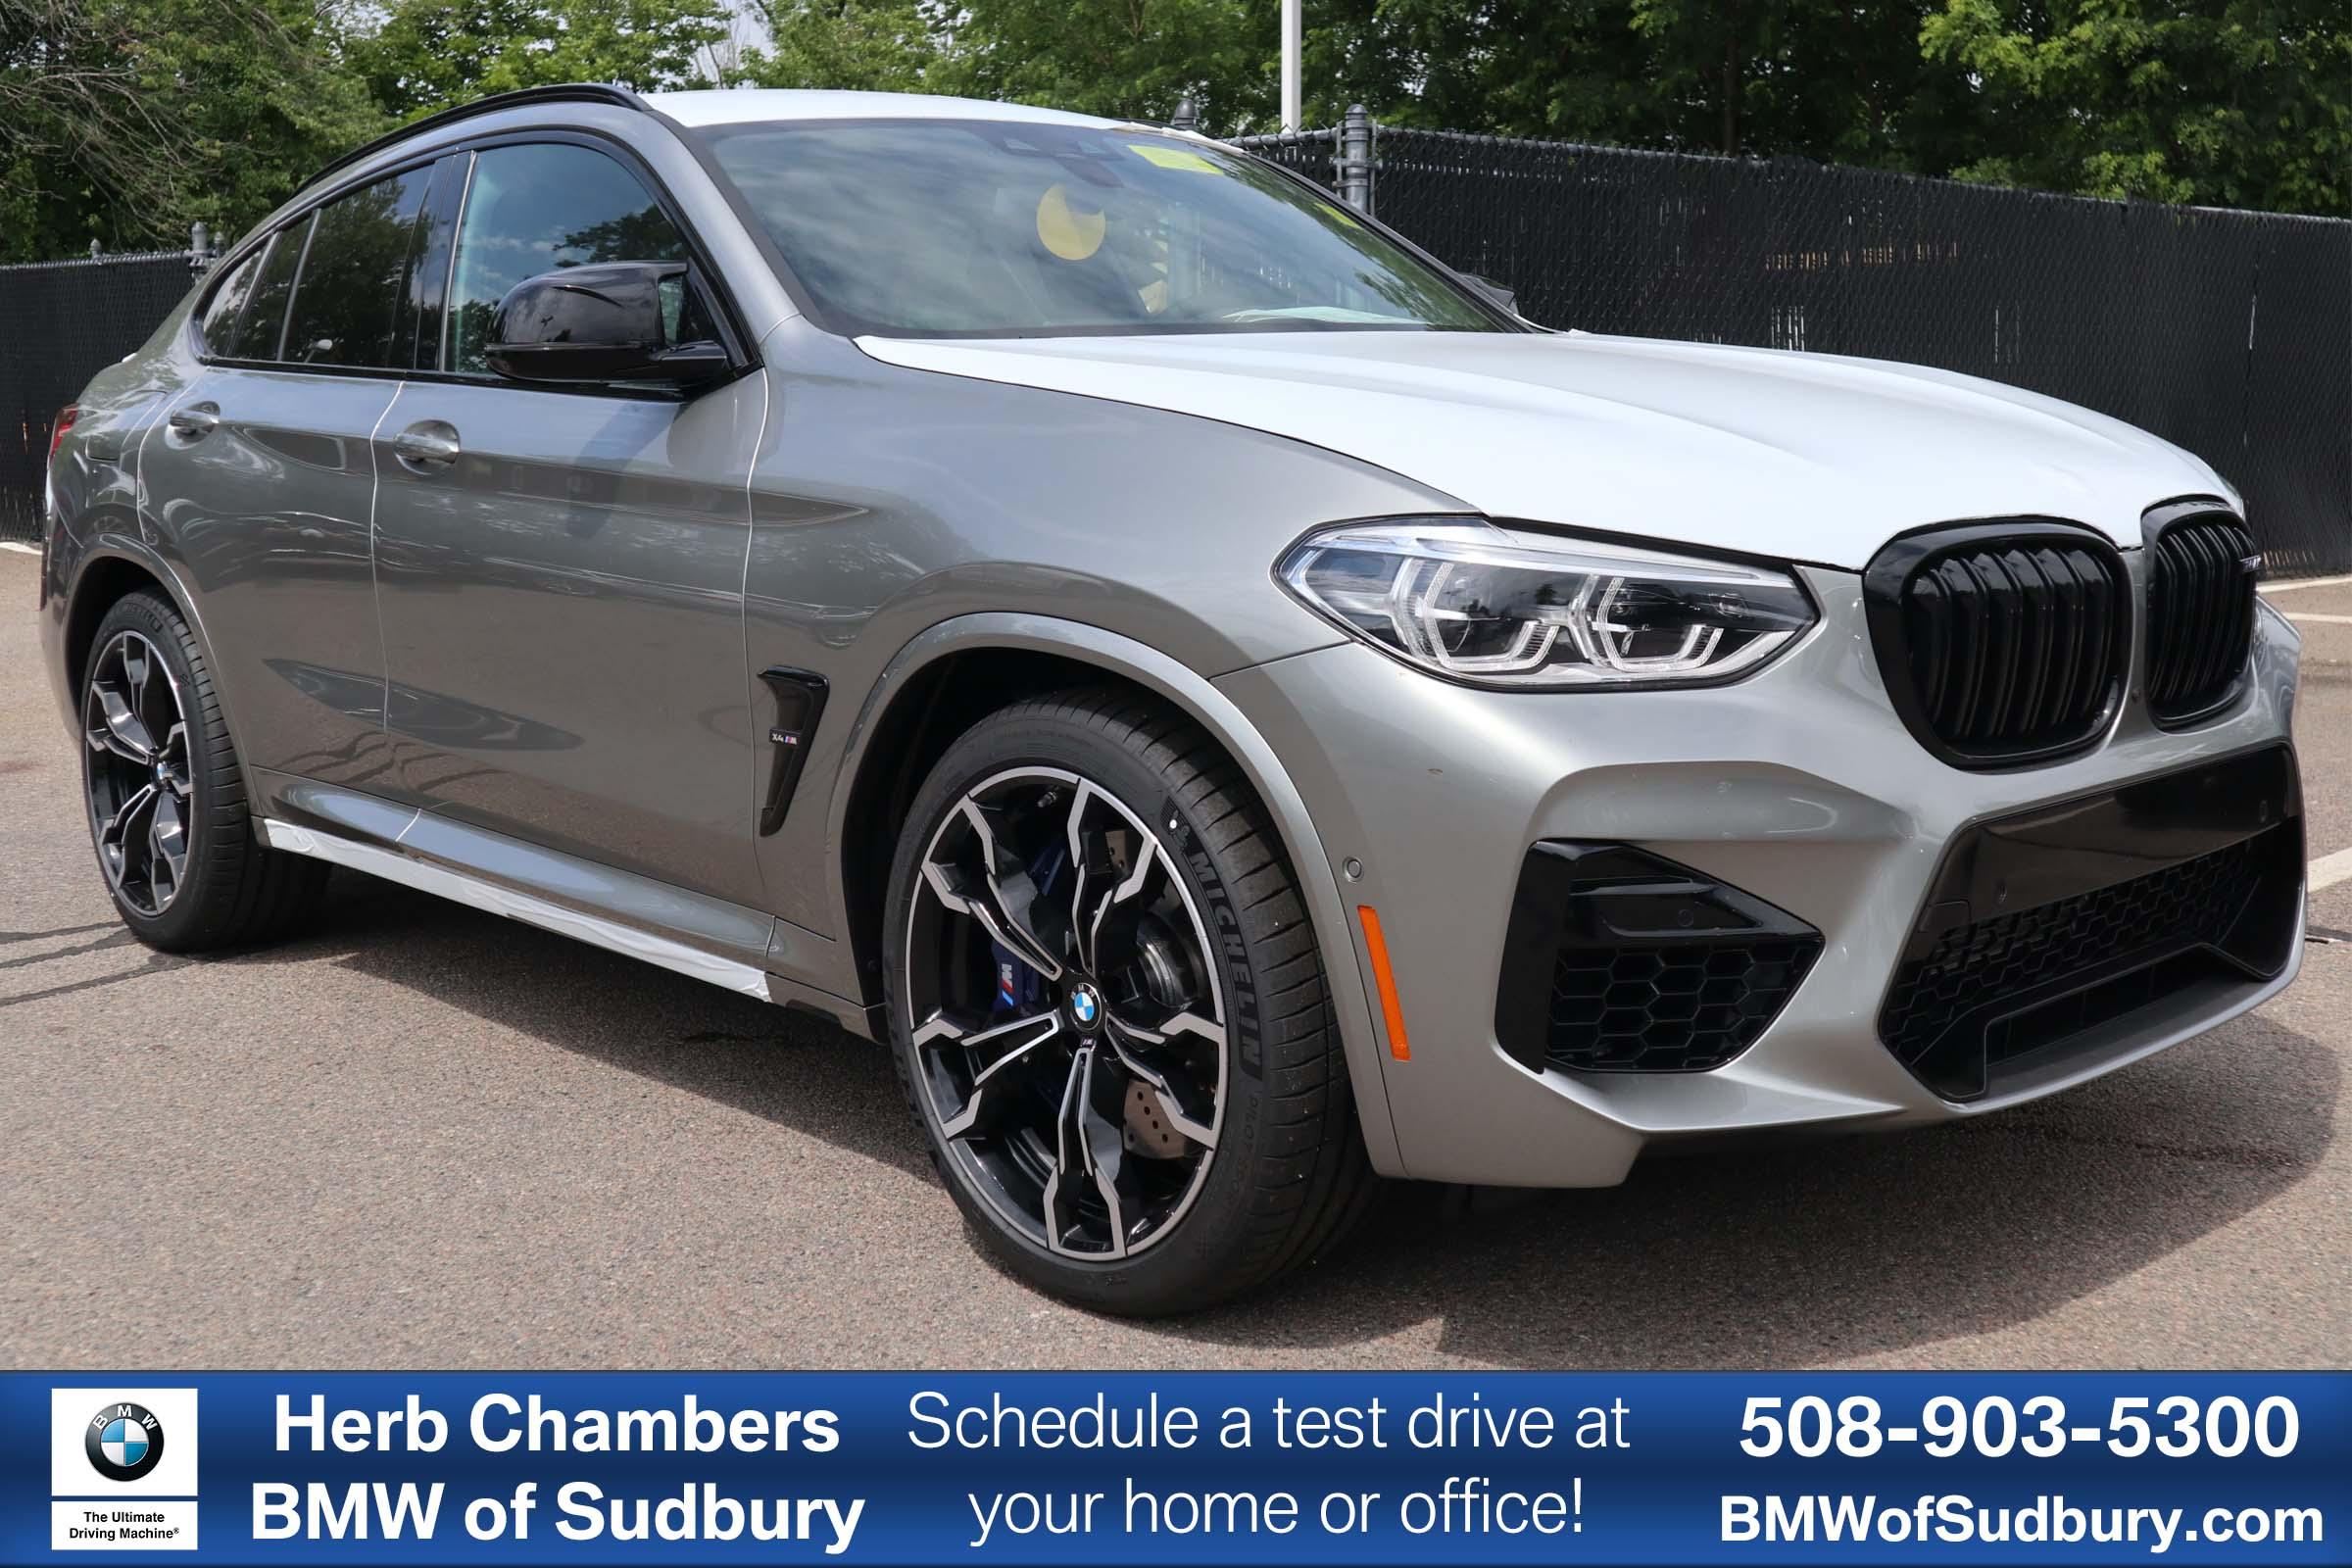 New 2020 BMW X4 M Competition in Sudbury MA near Boston